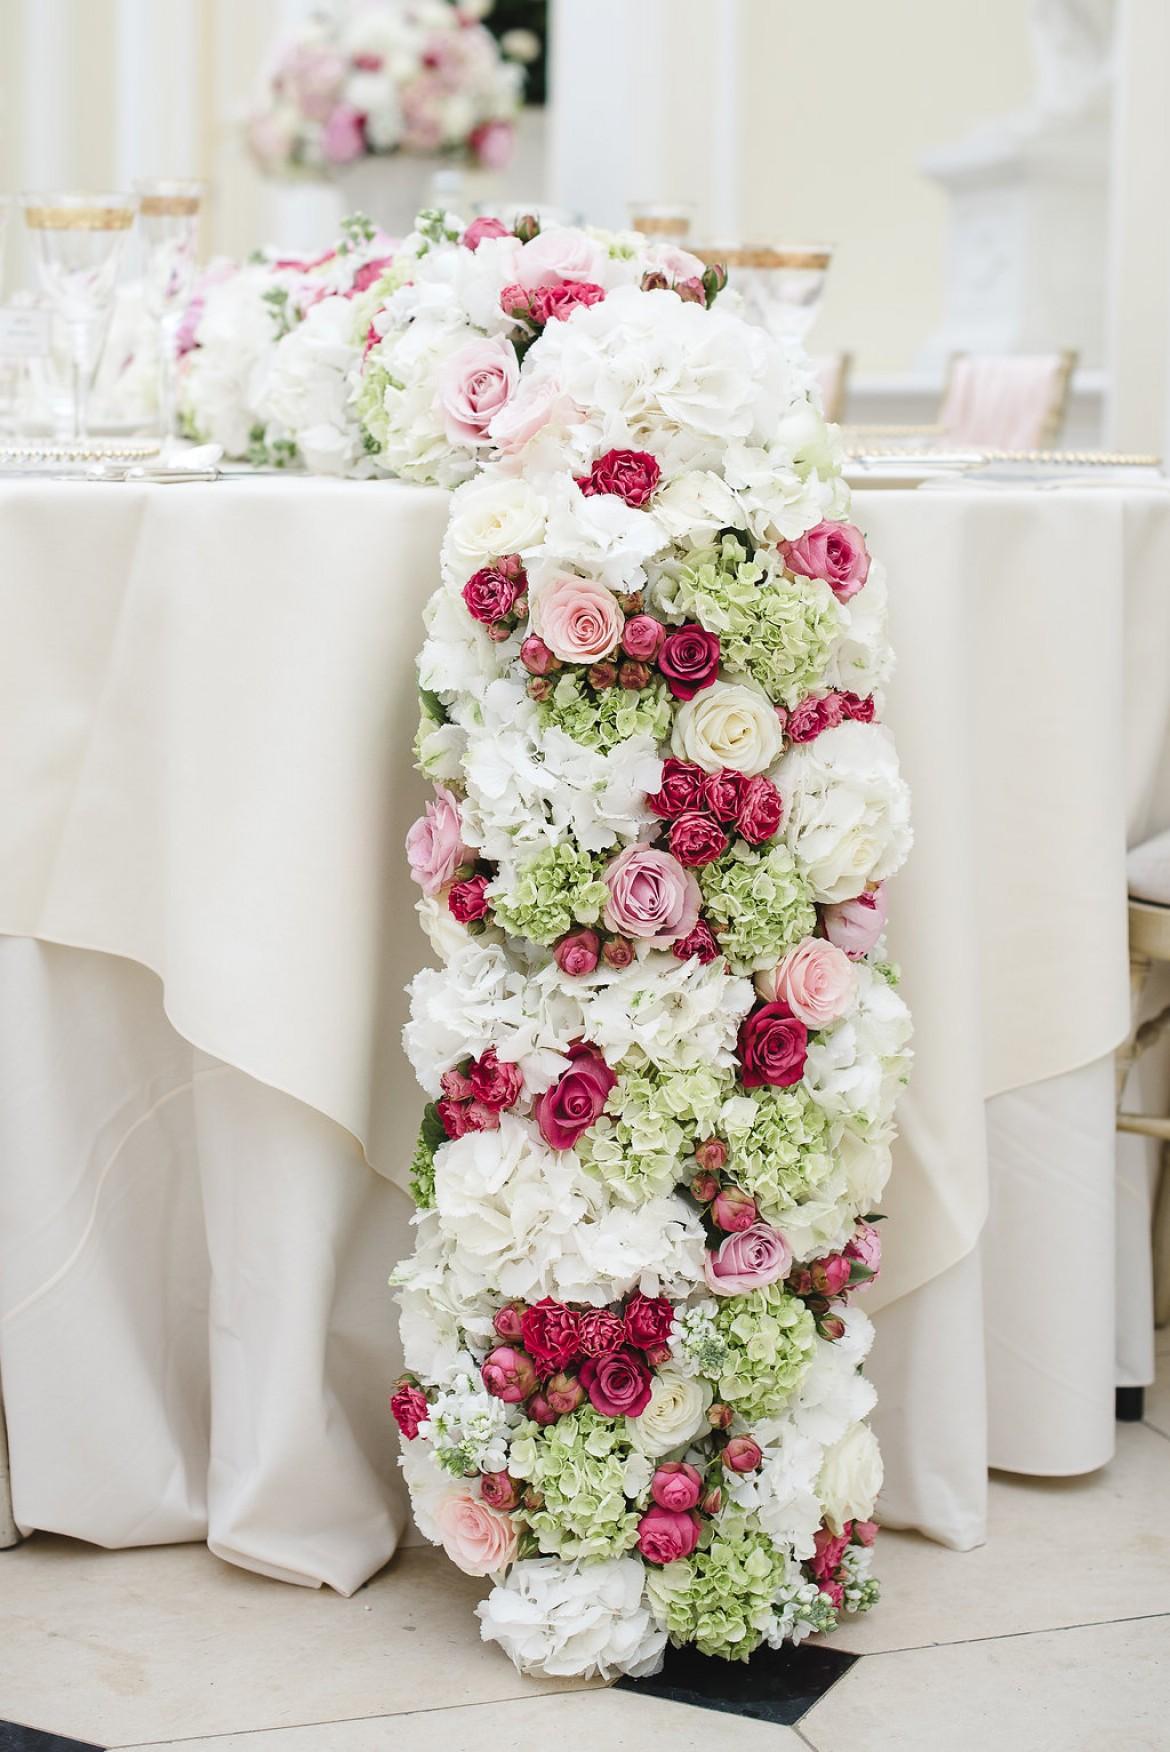 Fabulous Luxury Bespoke wedding Flowers Blenheim Palace Wedding Joanna Carter Wedding Flowers Oxfordshire Buckinghamshire Berkshire Gloucestershire Surrey London